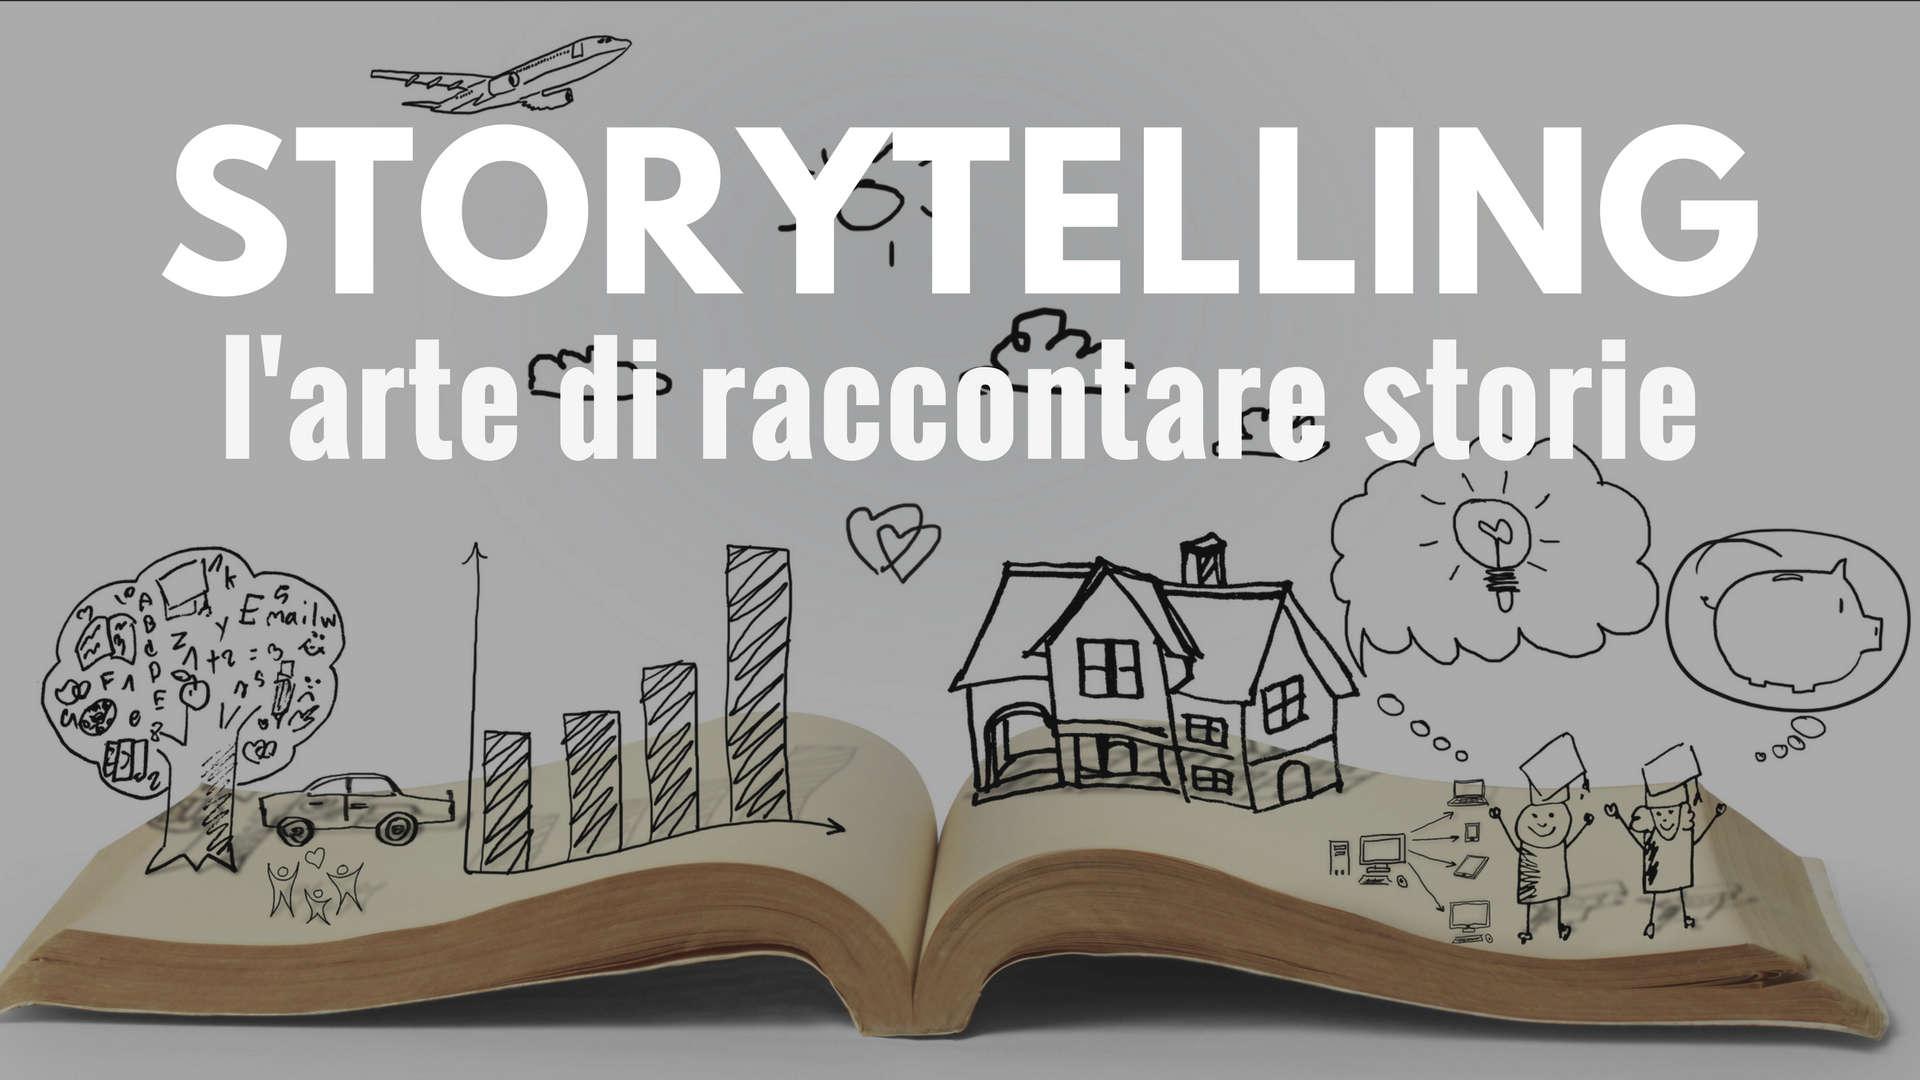 Storytelling, l'arte di raccontare storie